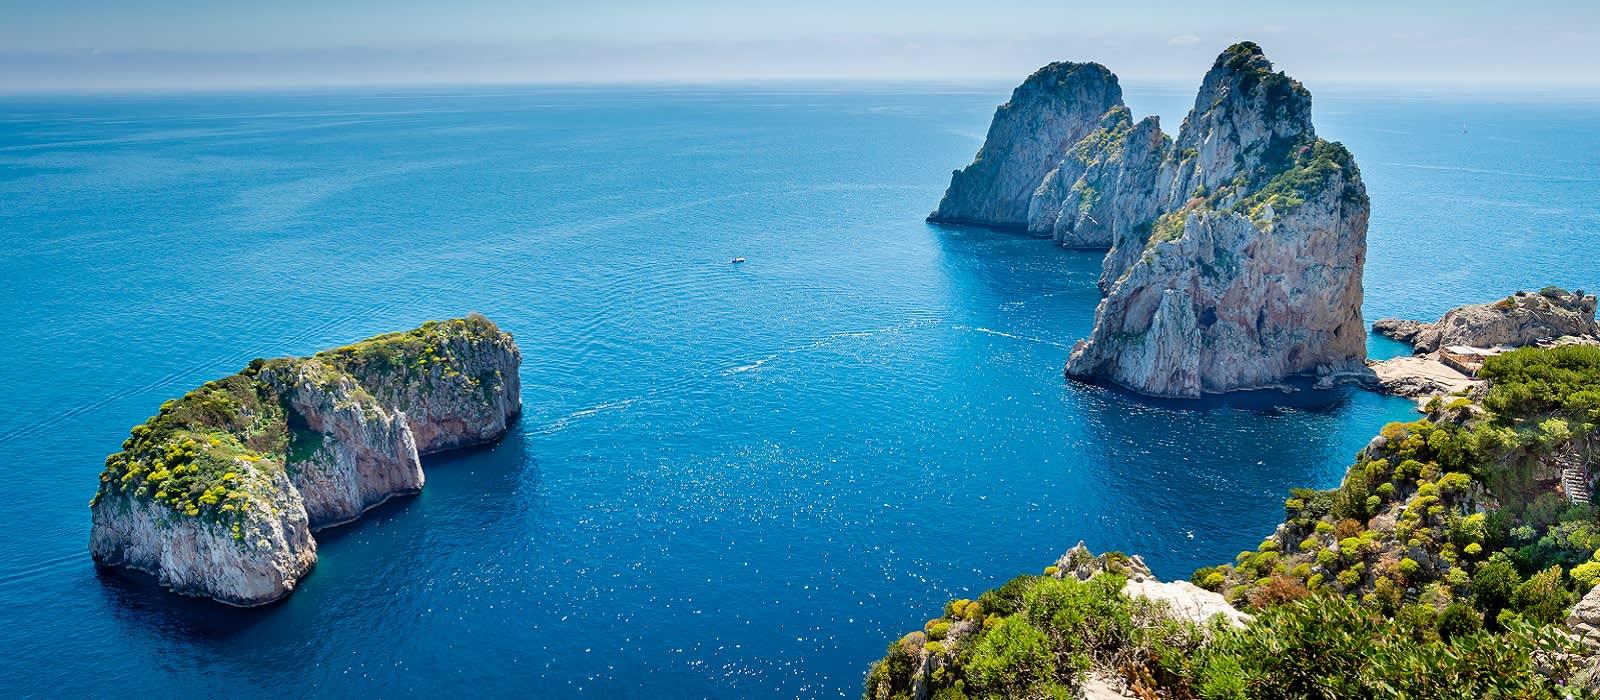 Enchanting Travels Italy Tours Faraglioni rocks view from hiking pass along Capri coastline , Italy.